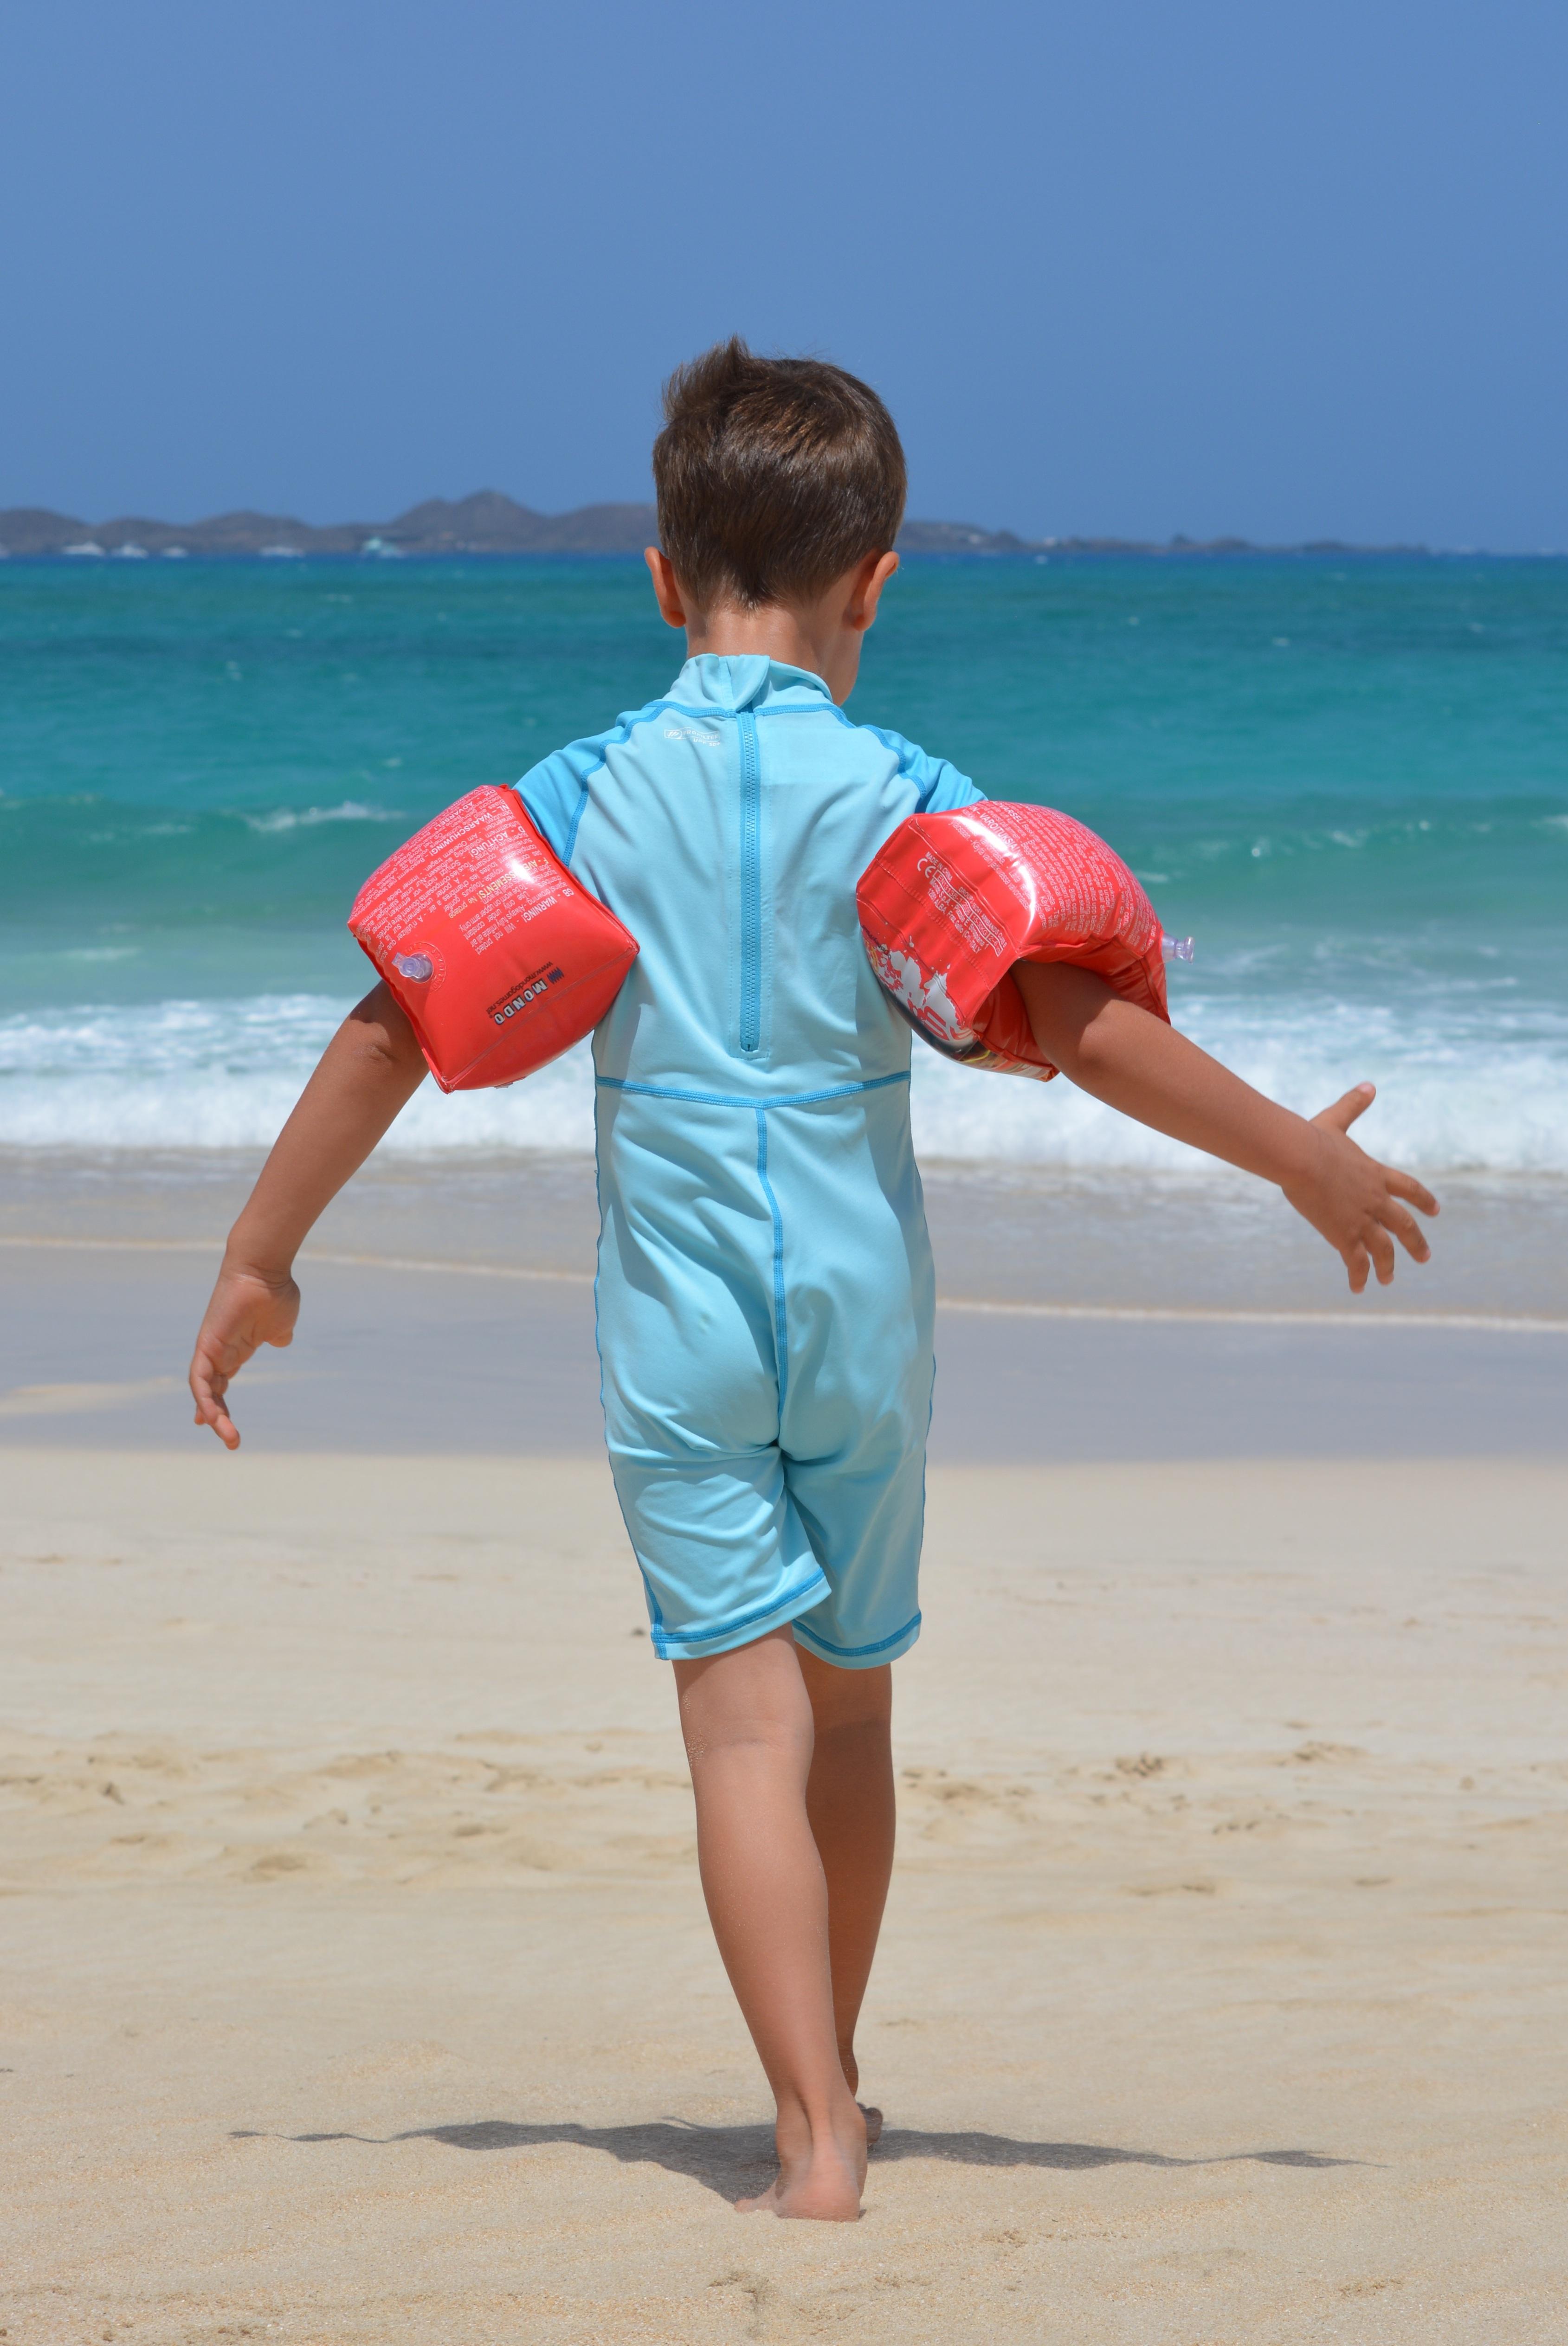 pantai laut pasir lautan orang orang pantai Anak laki laki liburan anak biru badan